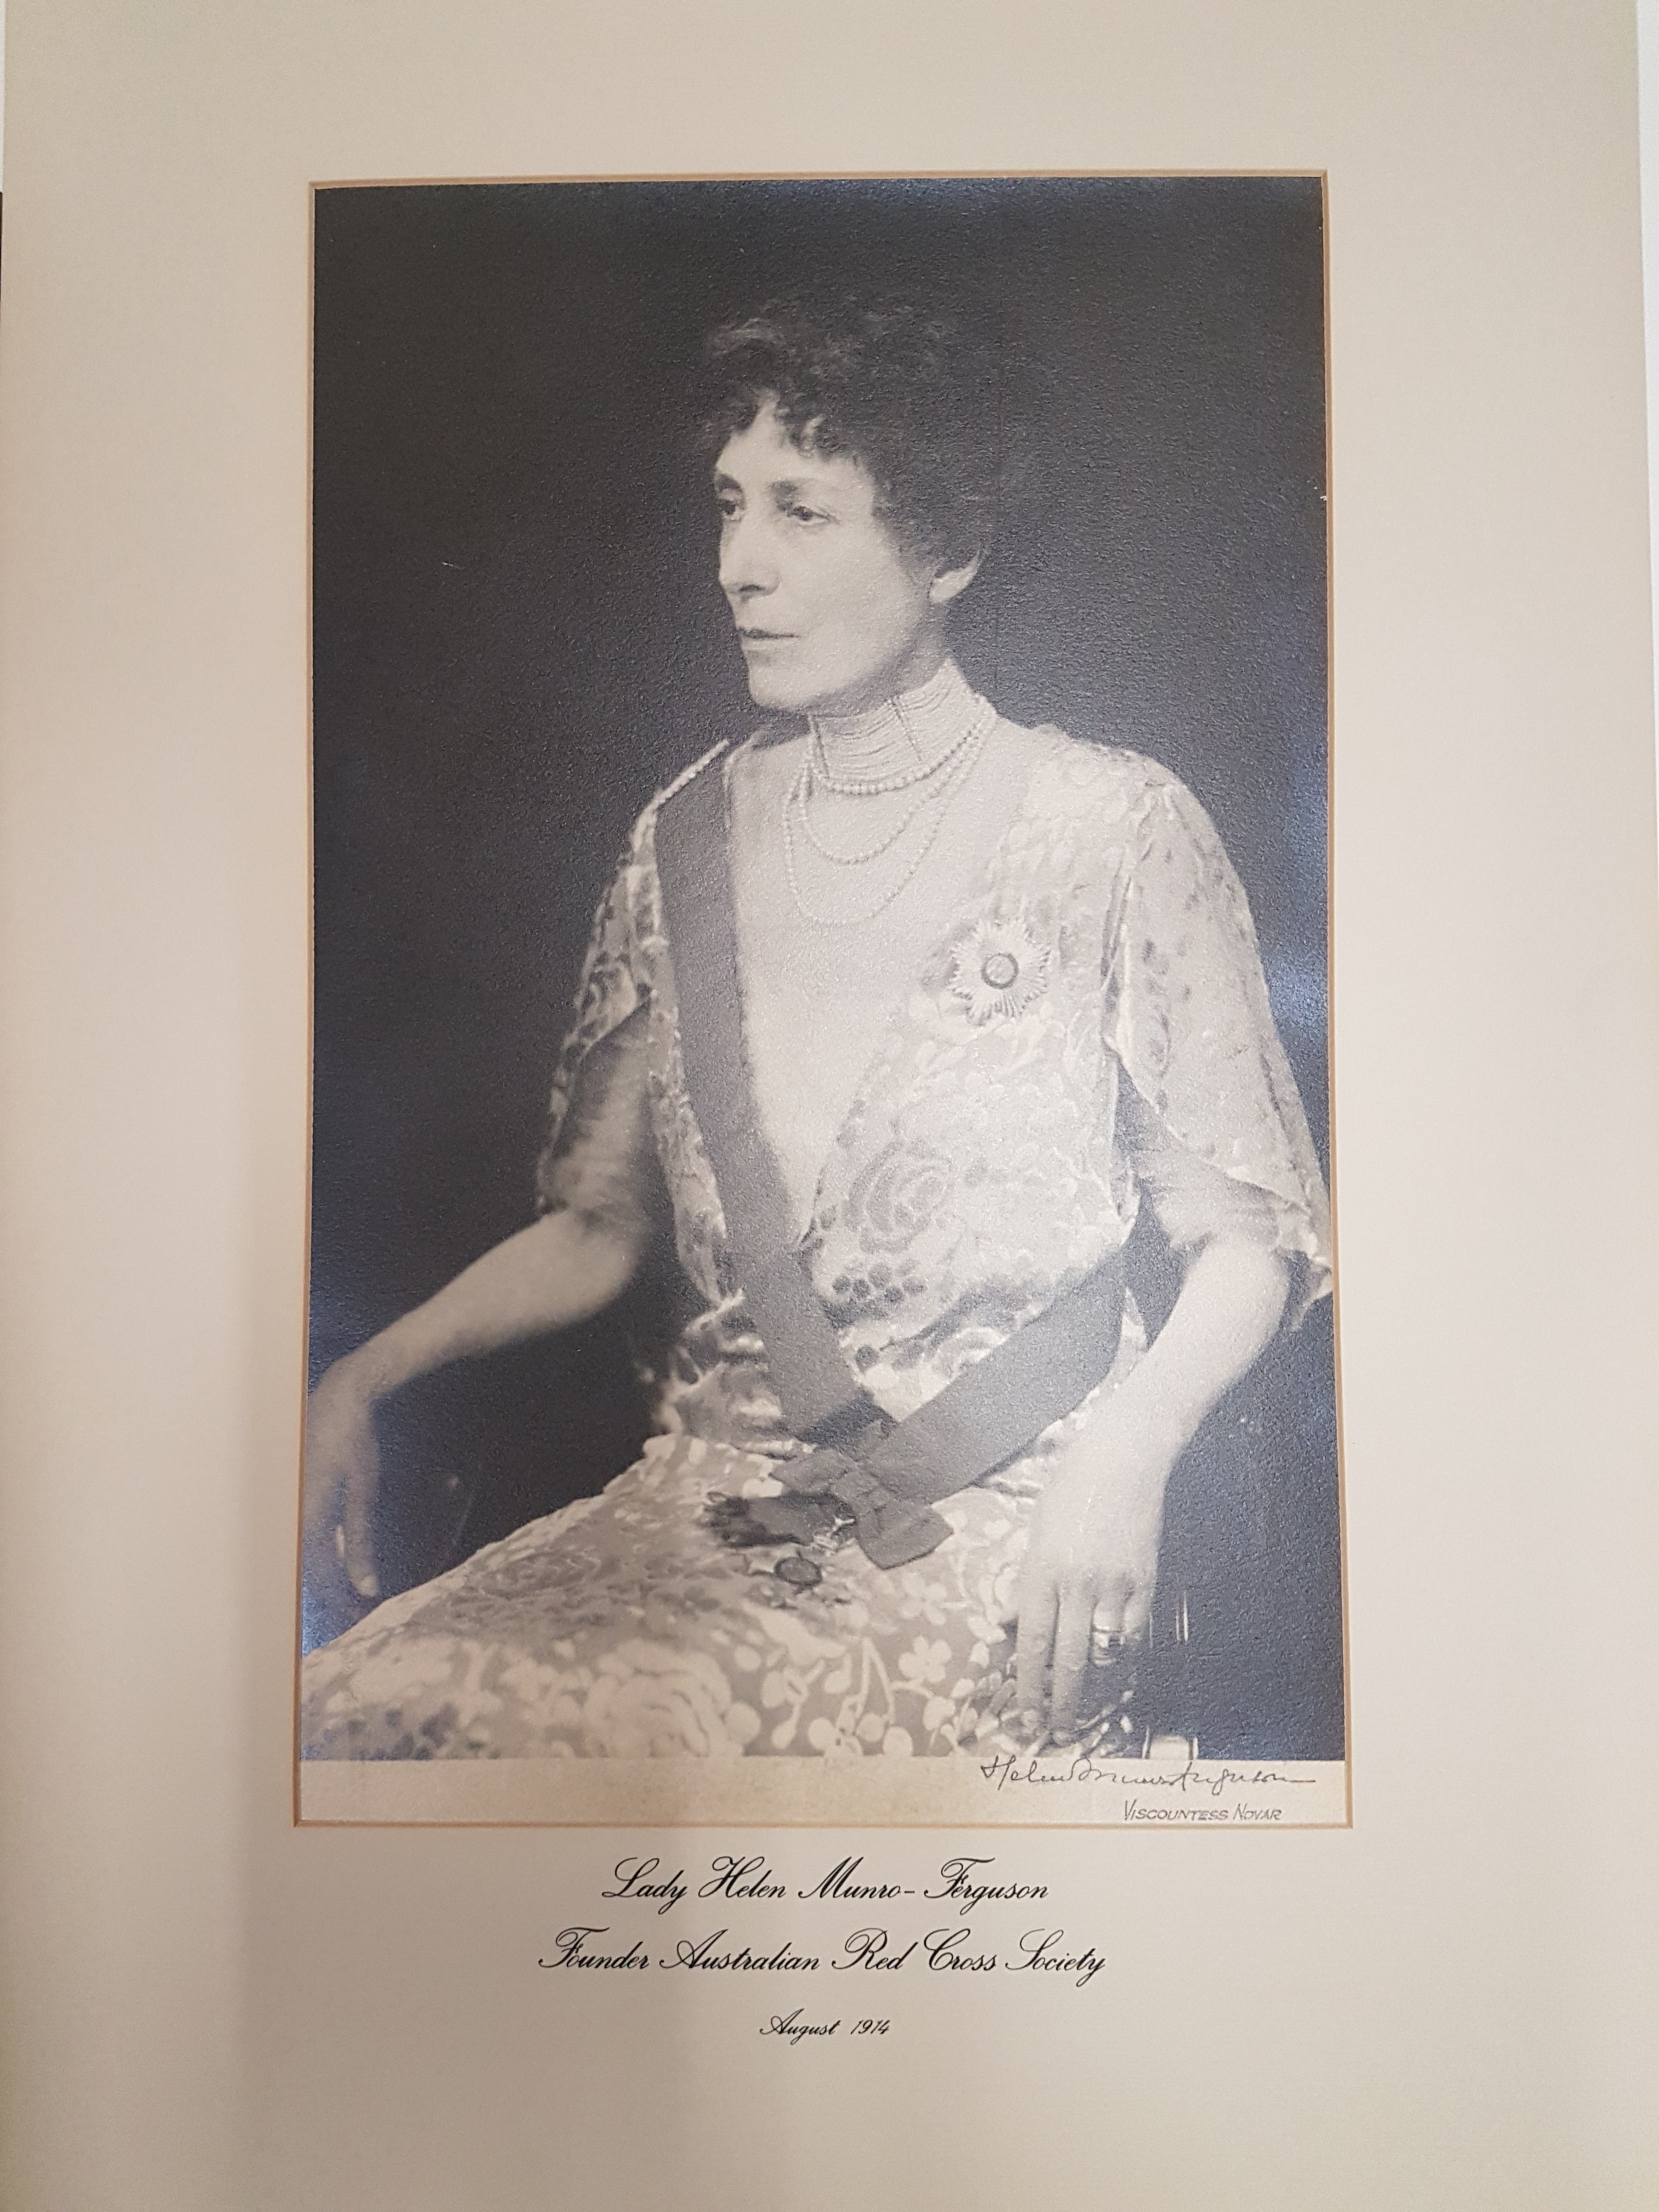 •Portrait of Lady Helen Munro-Ferguson, founder of the Australian Red Cross Society, August 1914